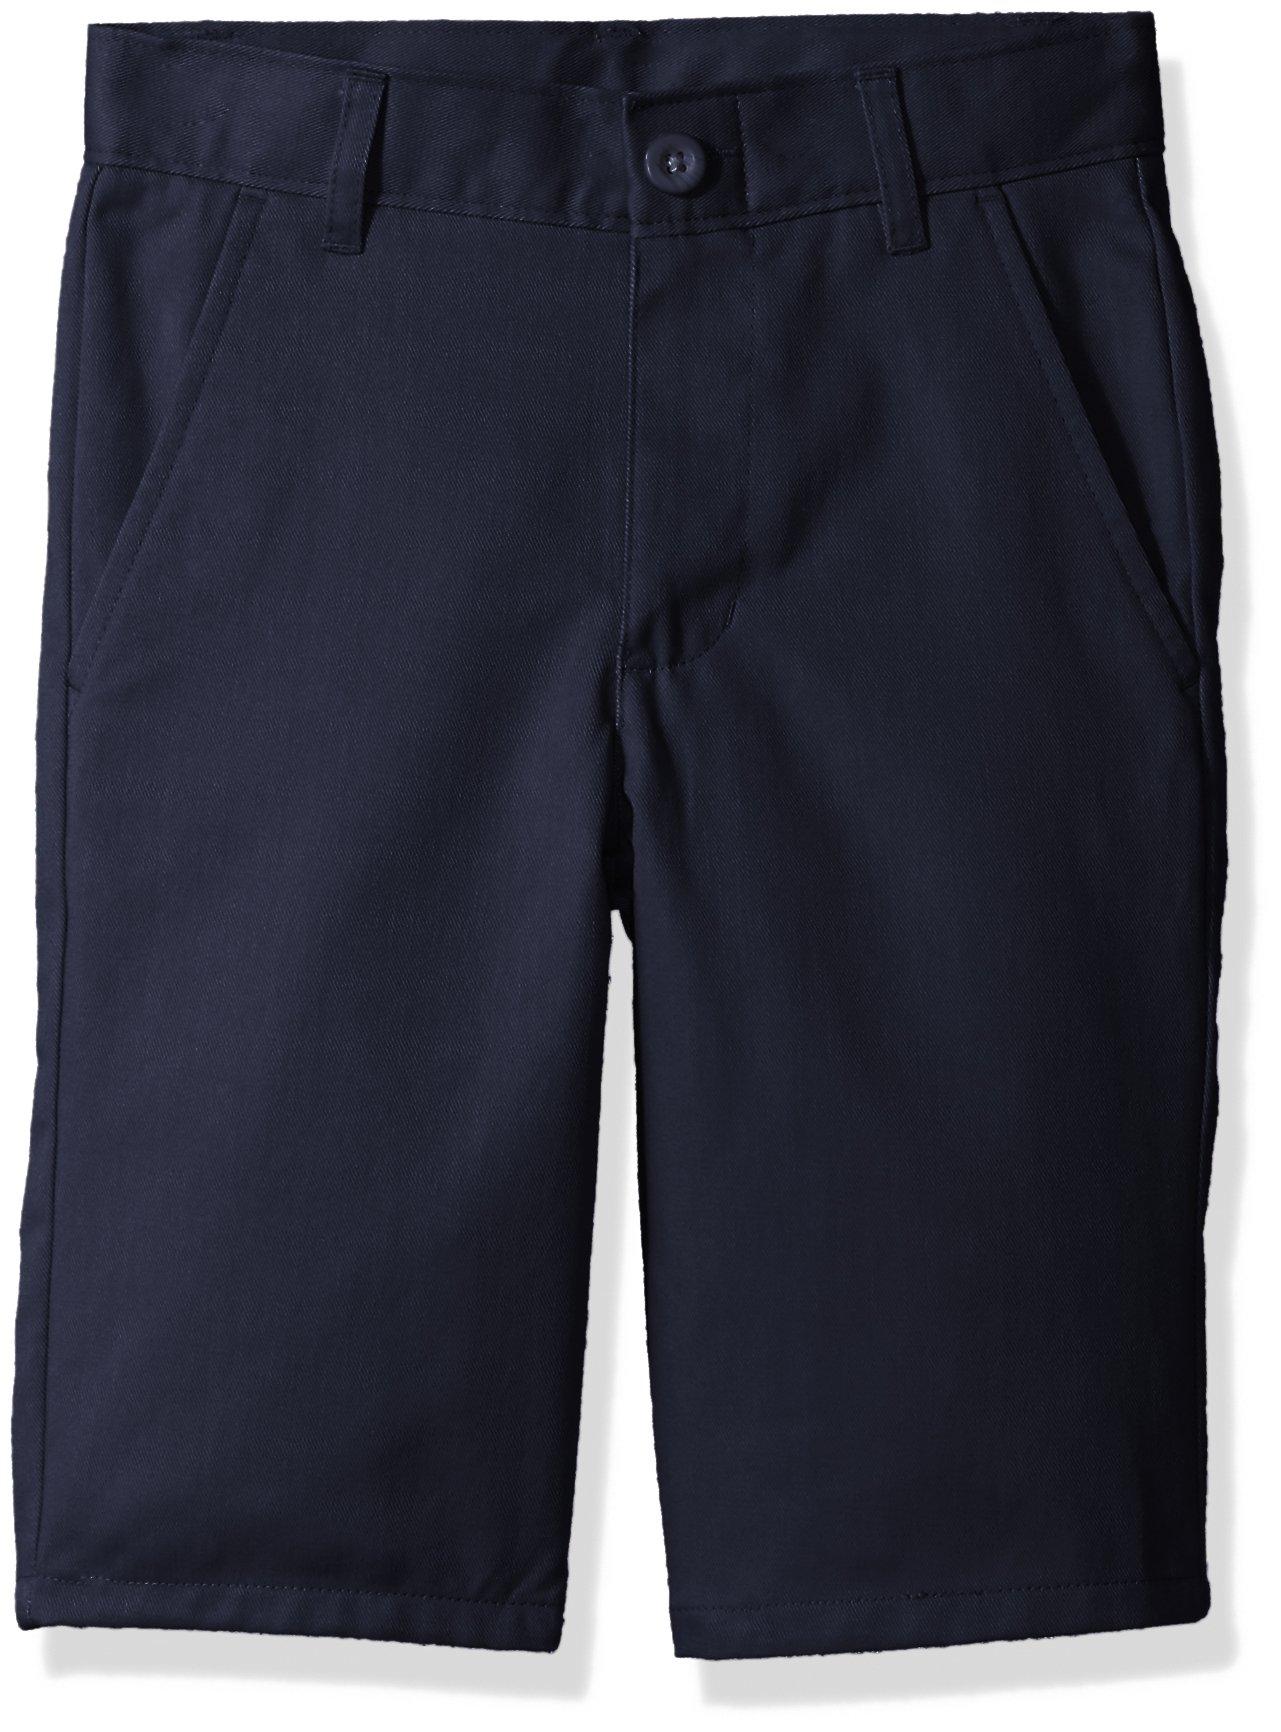 Nautica Boys' Slim Size Flat Front Twill Short, Su Navy, 14